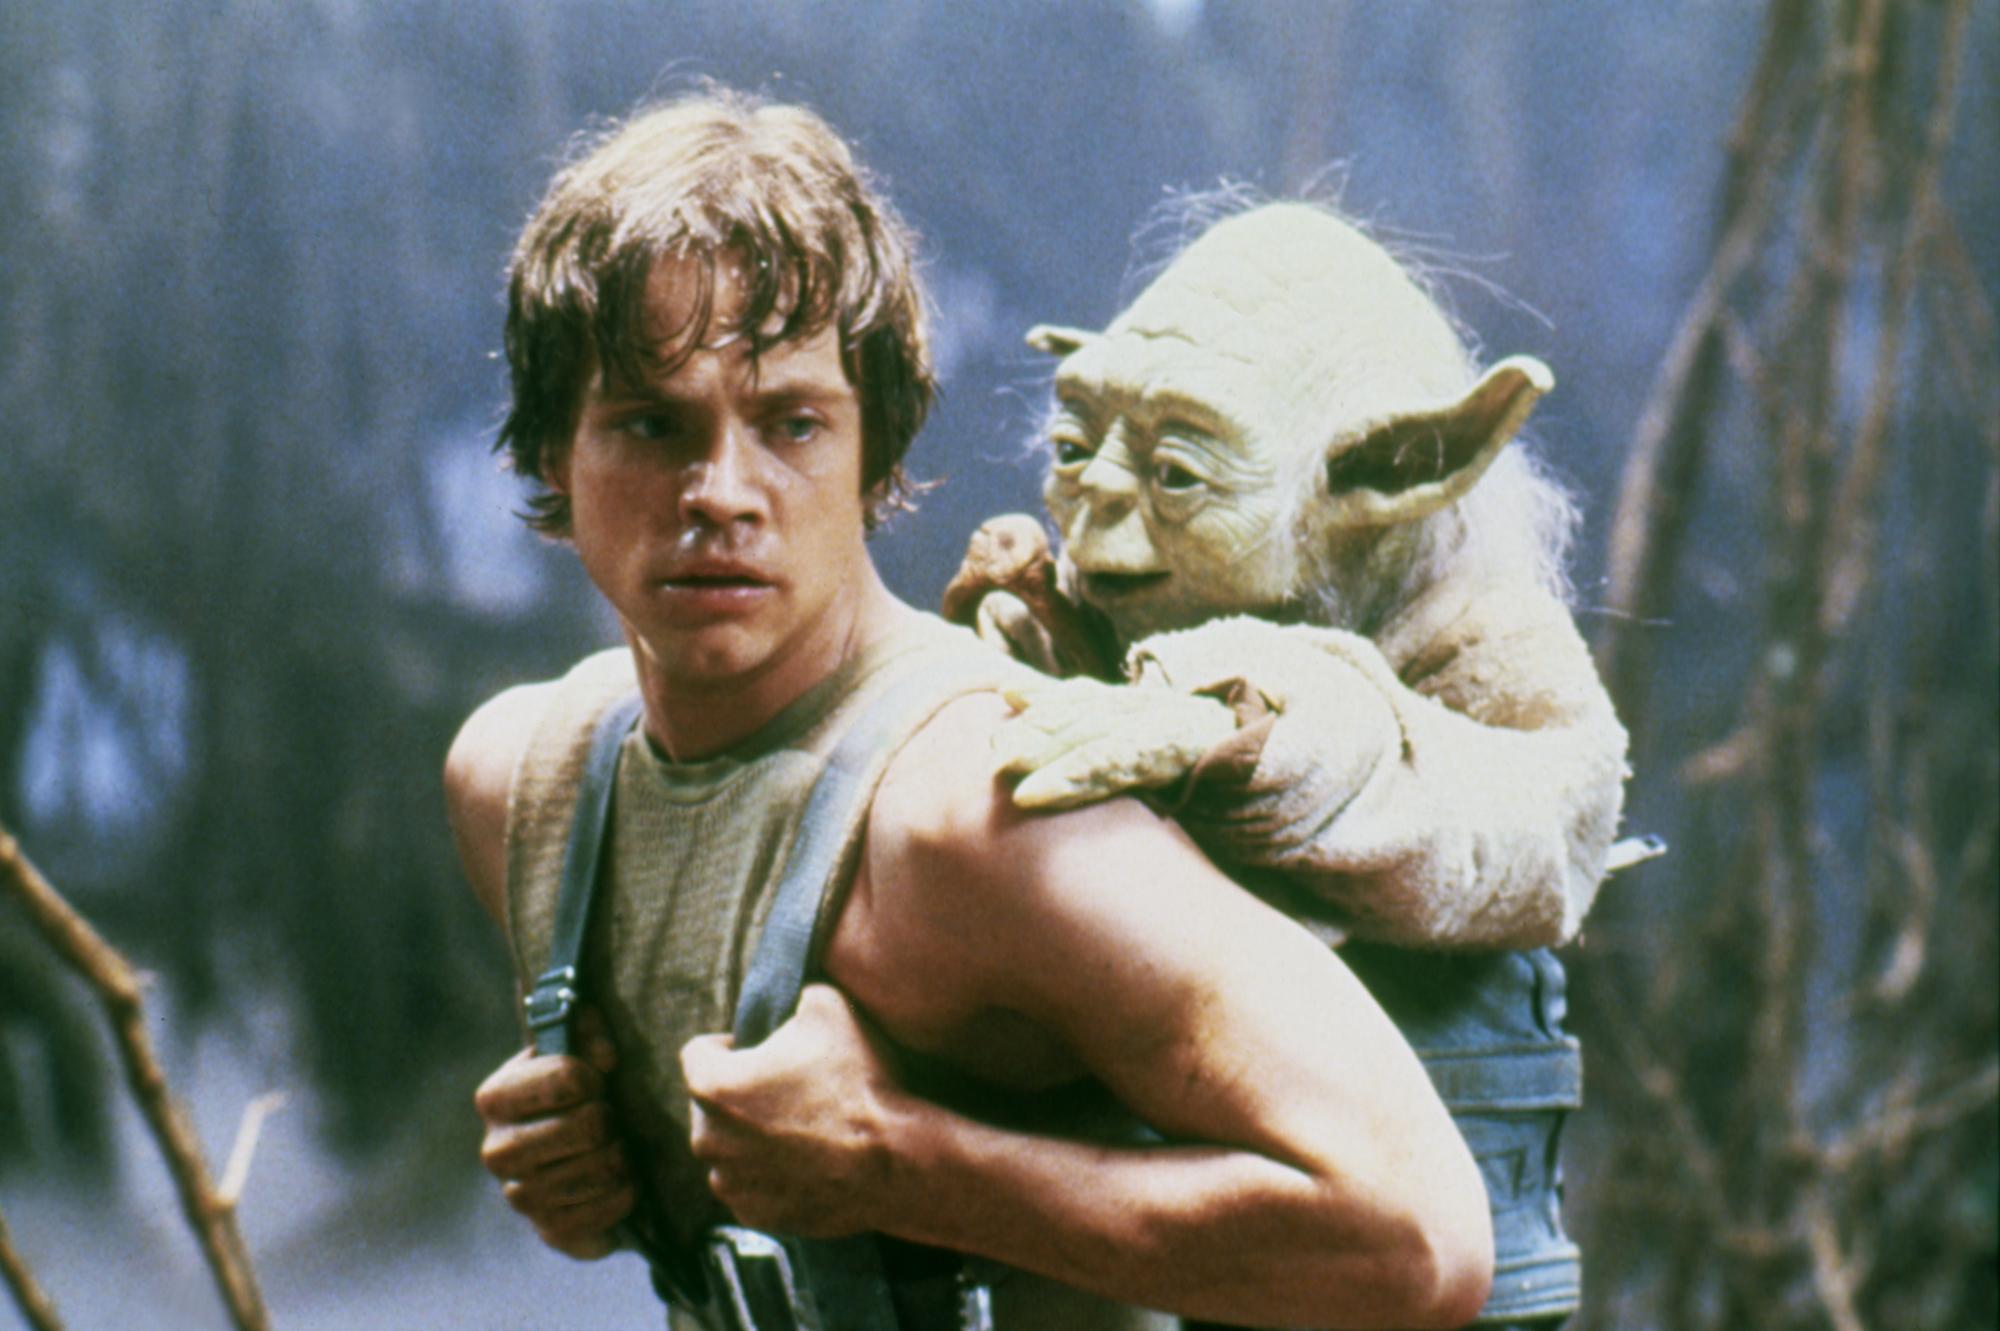 Mark Hamill on the set of 'Star Wars: Episode V - The Empire Strikes Back' directed by Irvin Kershner